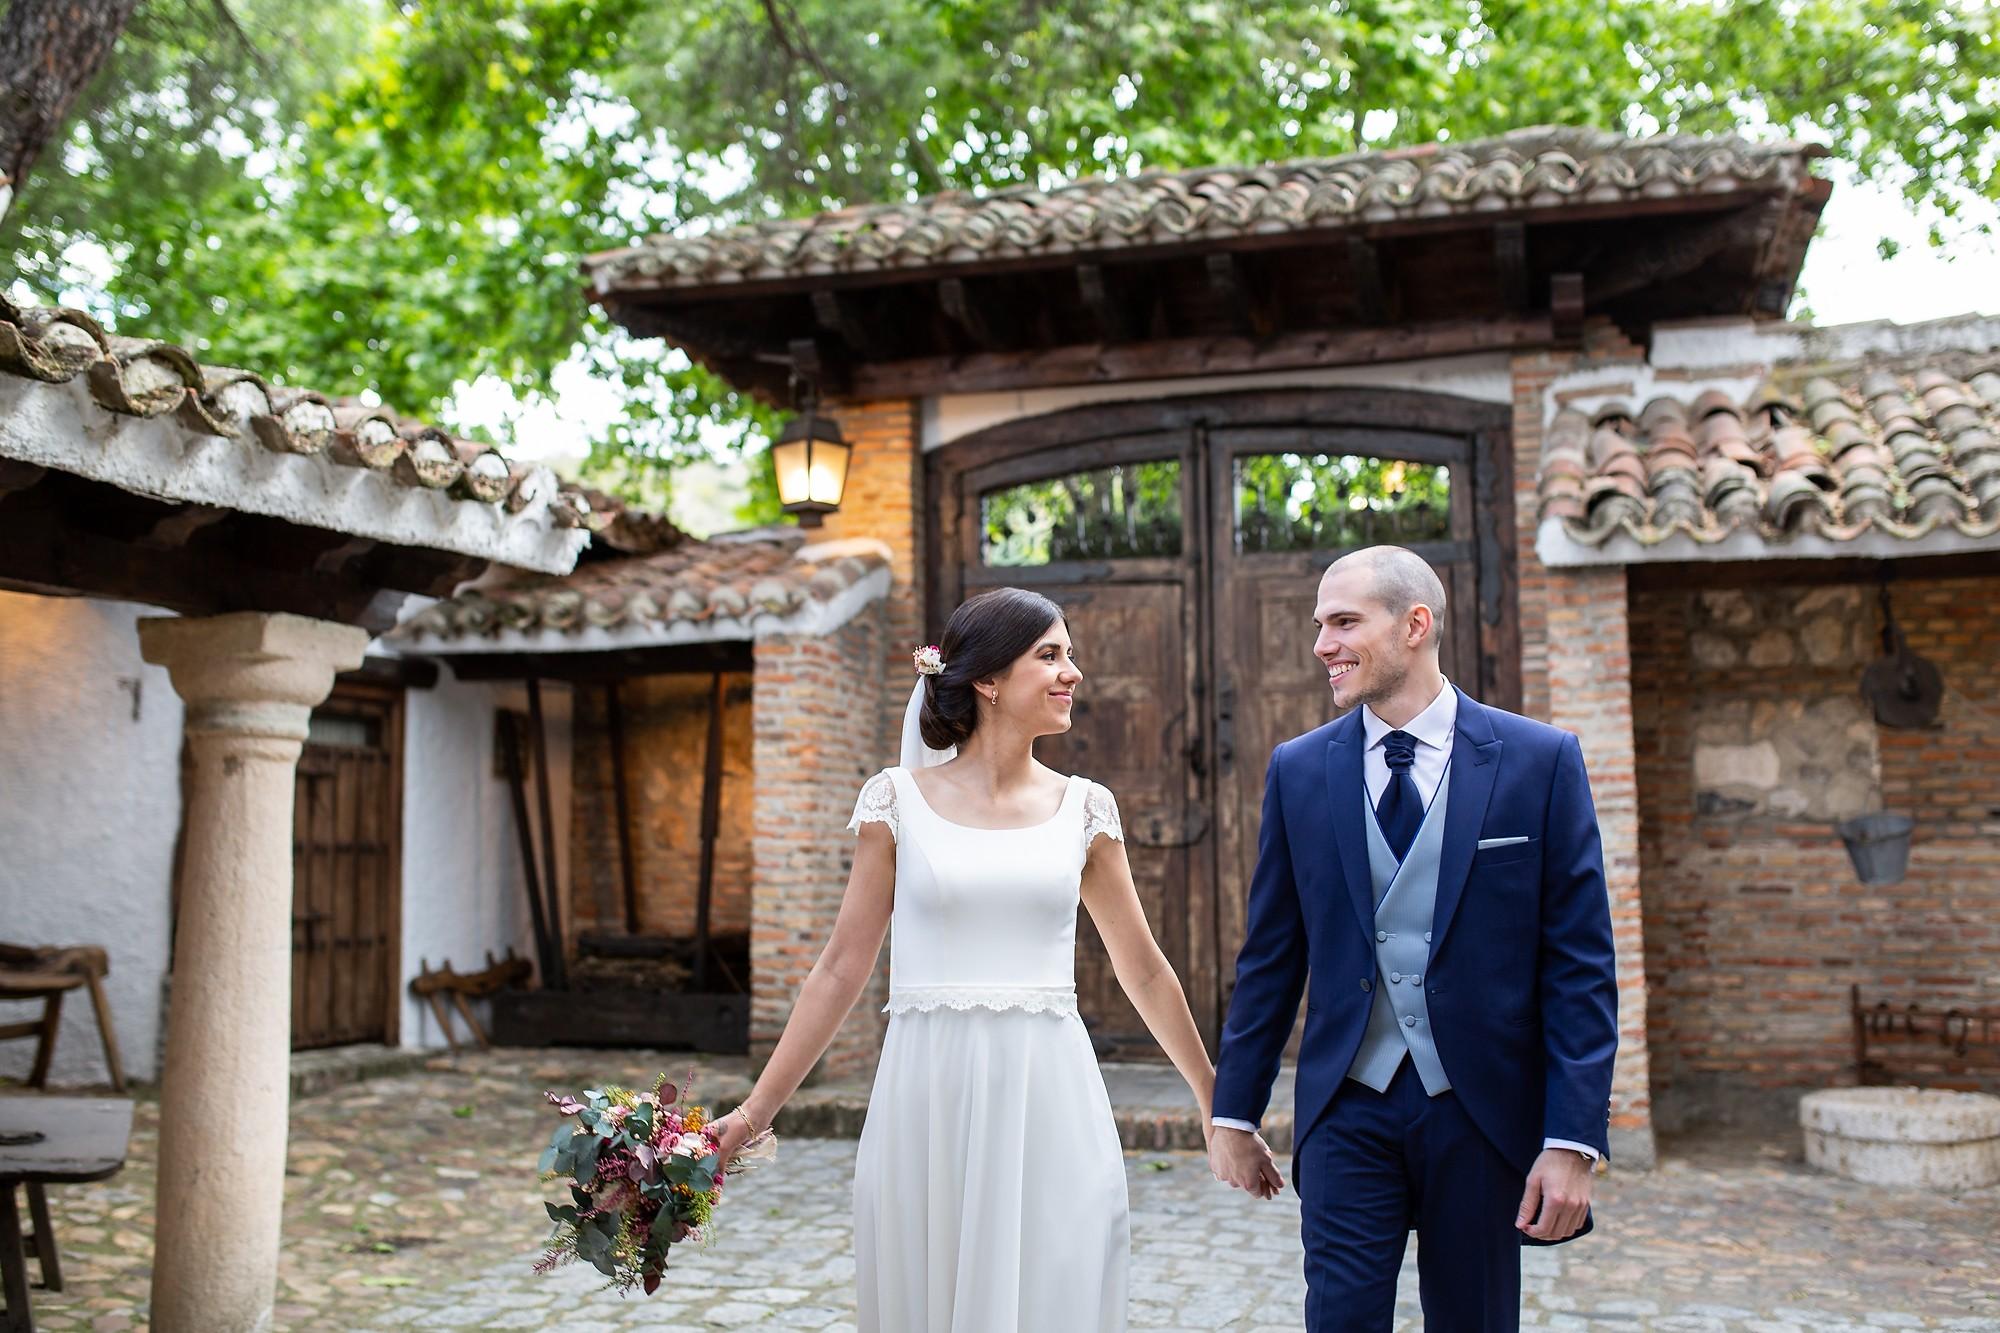 boda-palacio-negralejo-fotografos-boda-madrid-a1185